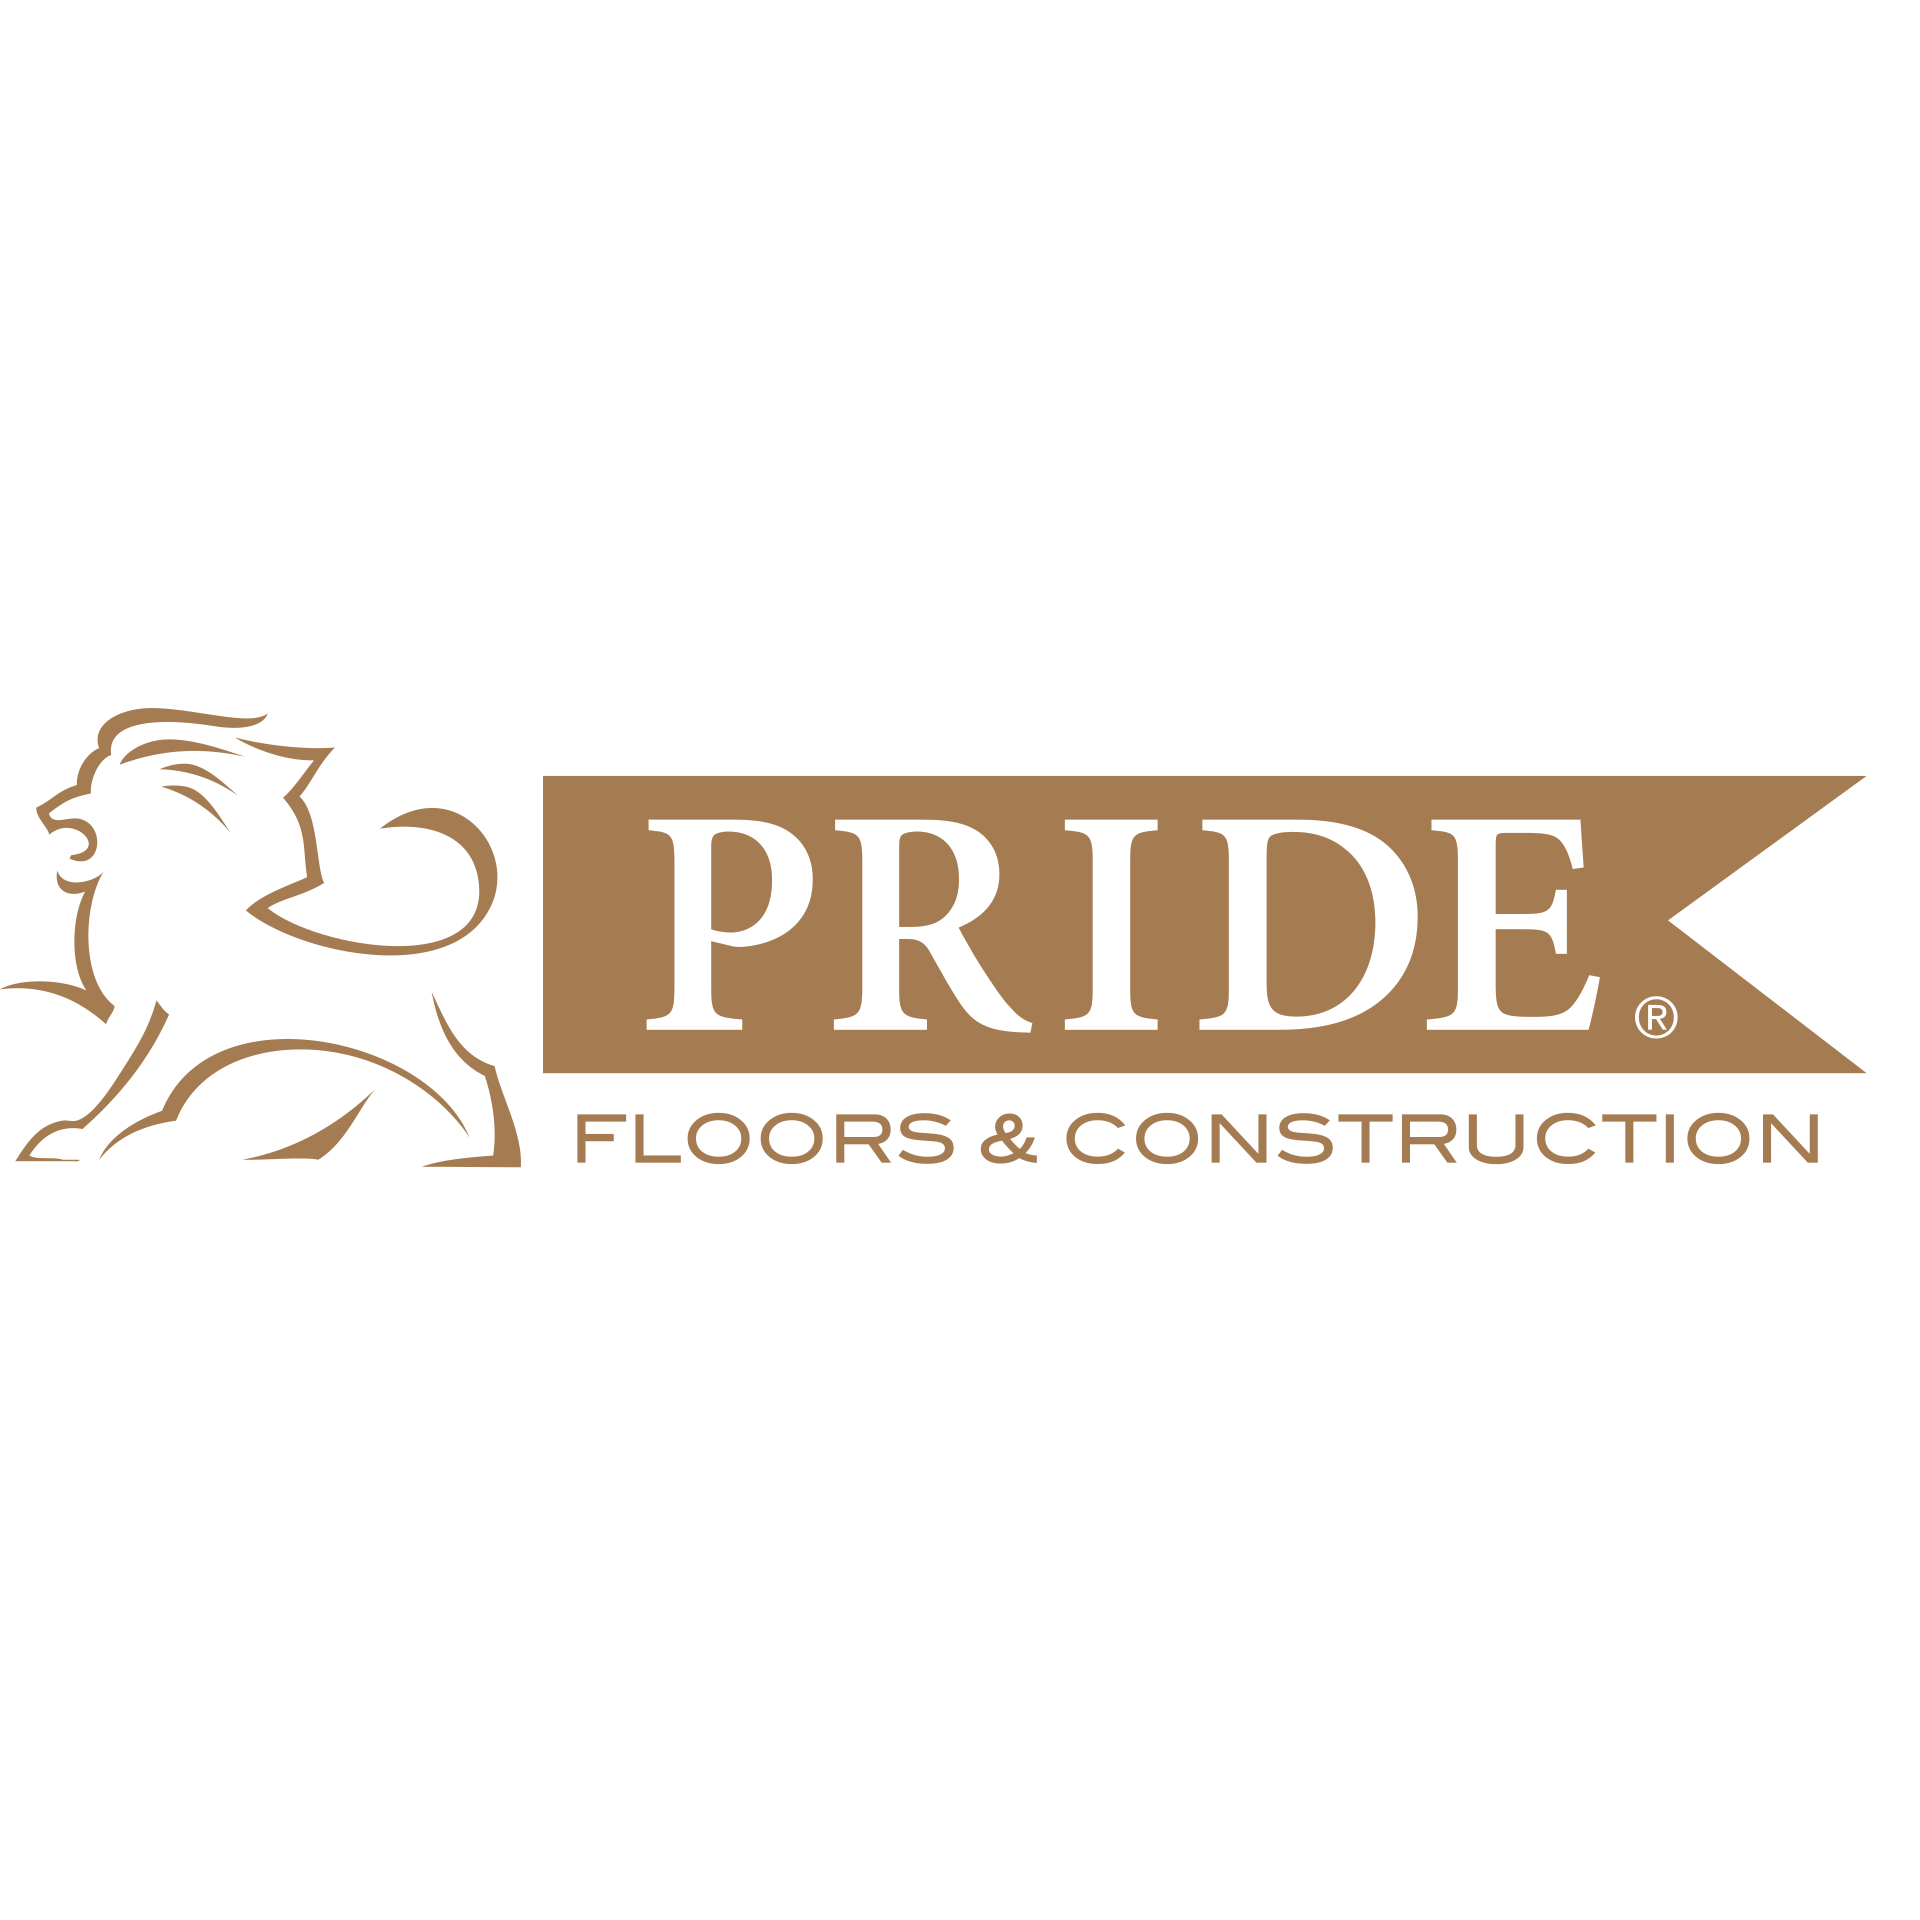 Pride Floors & Construction LLC